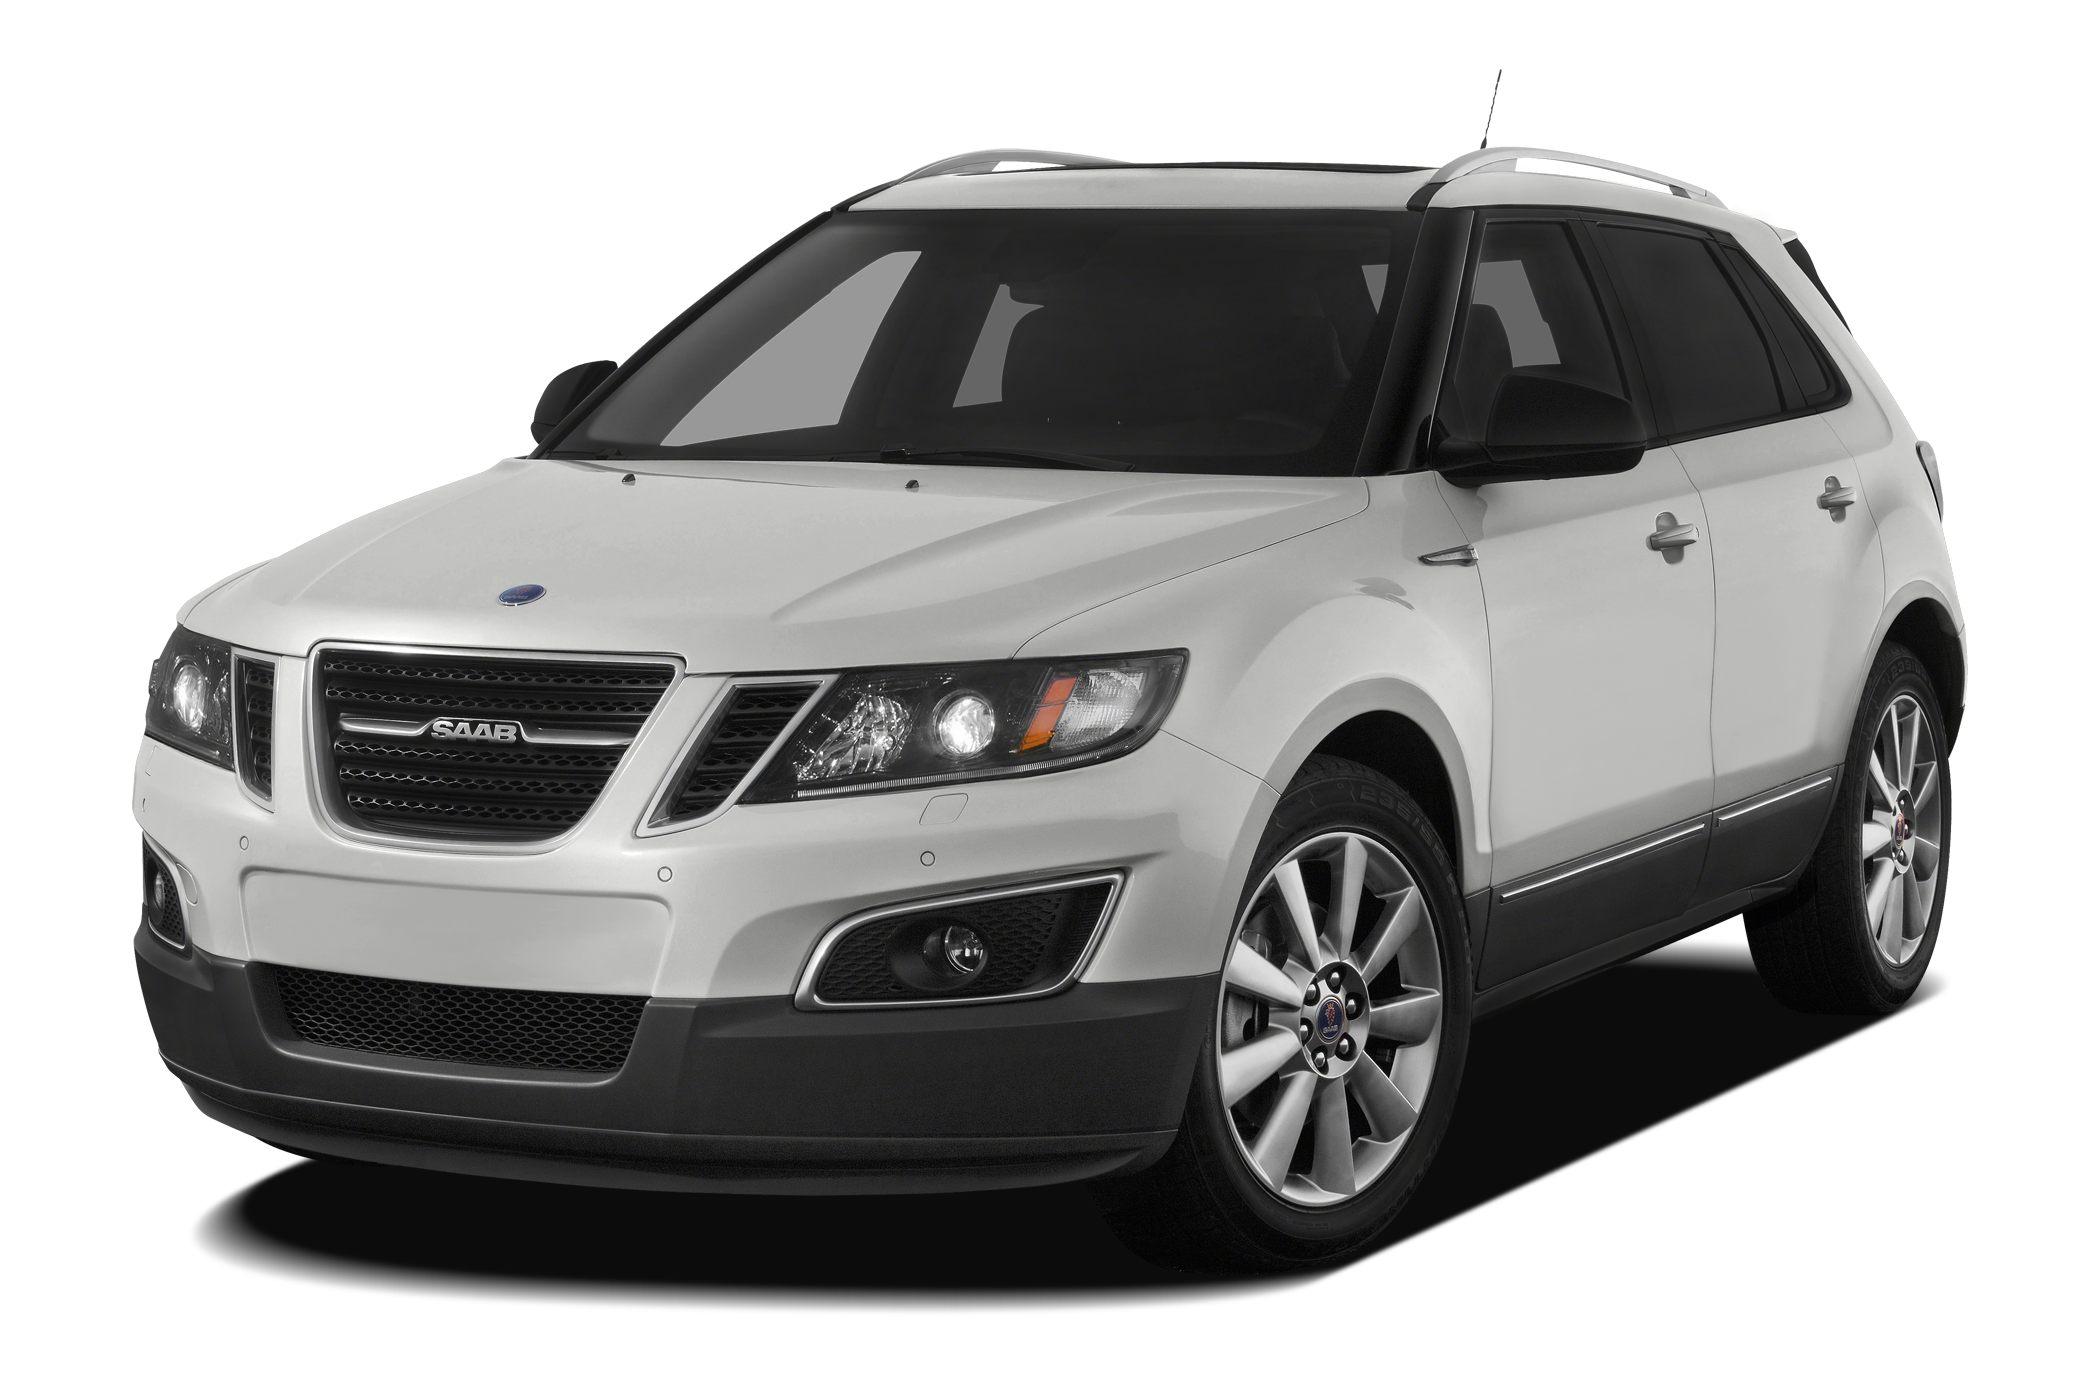 Ford incentives and rebates 2011 Ford motor rebates